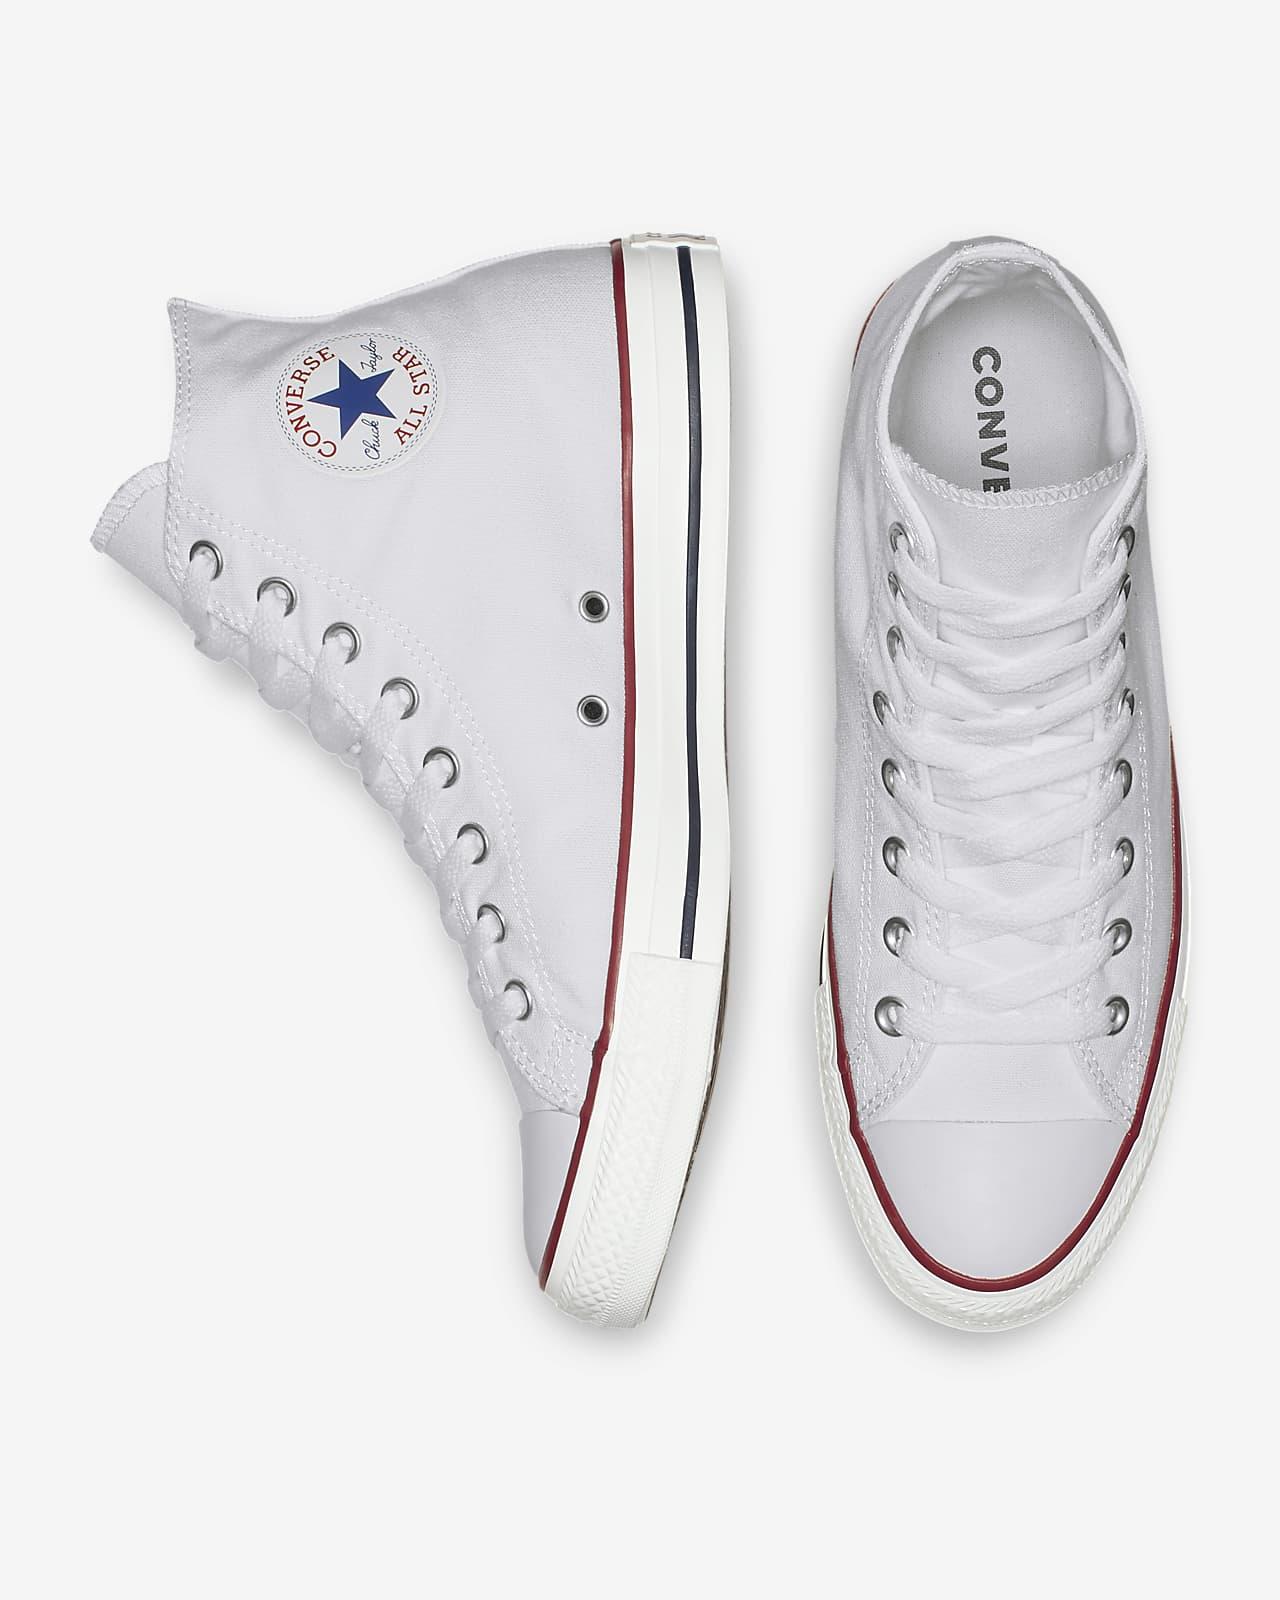 converse all star store near me